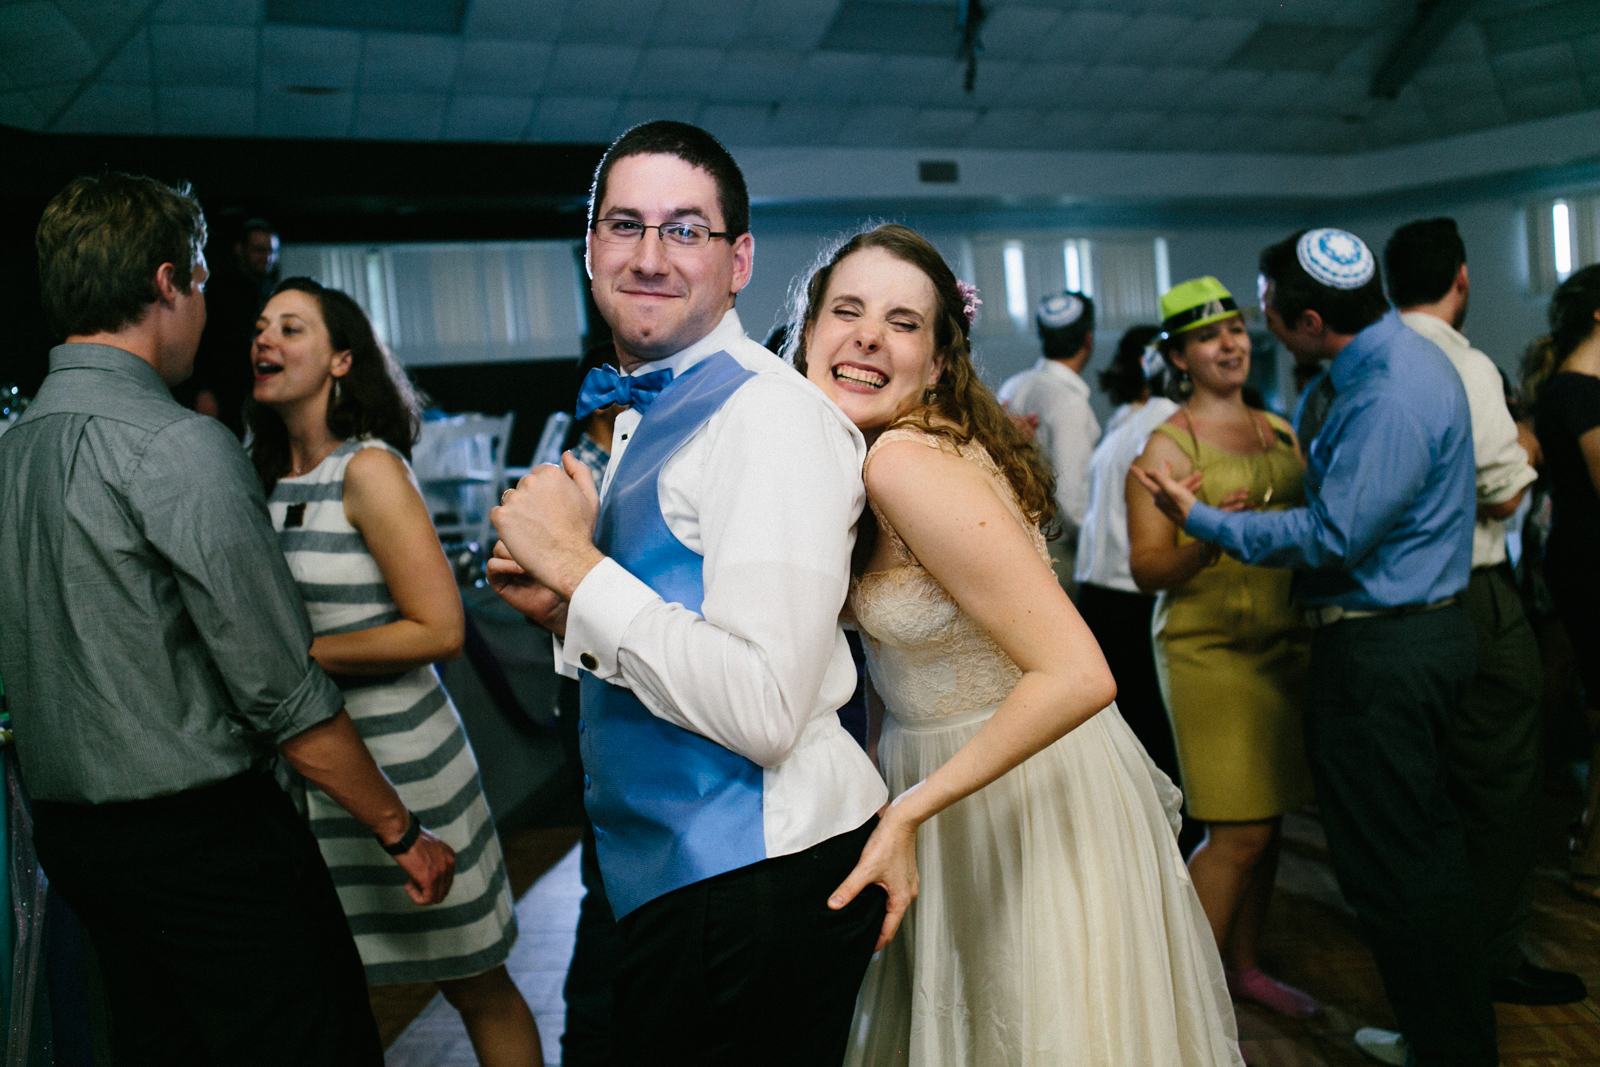 newlyweds dancing butt grab